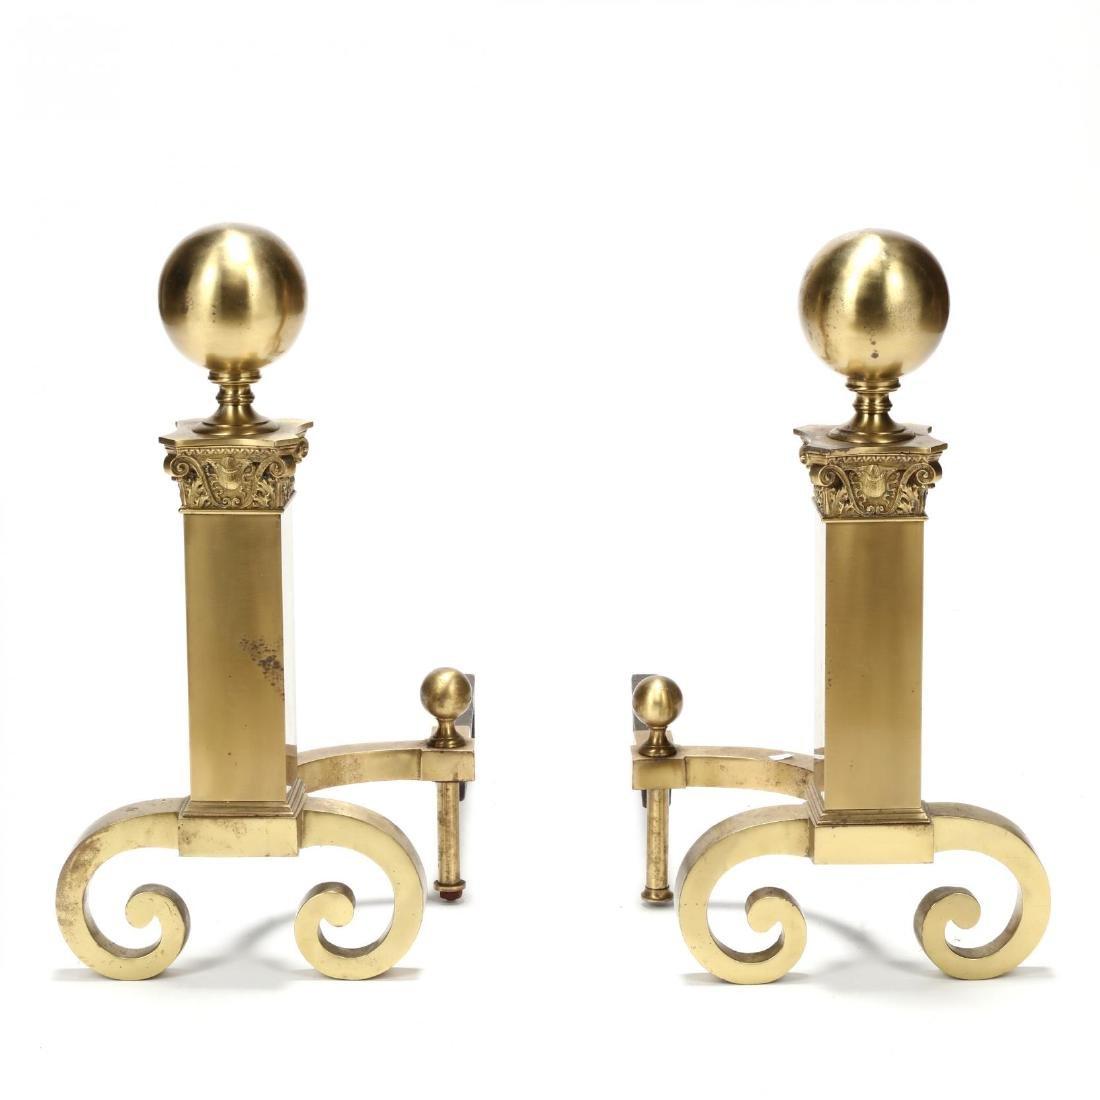 Pair of Greco-Roman Style Brass Andirons